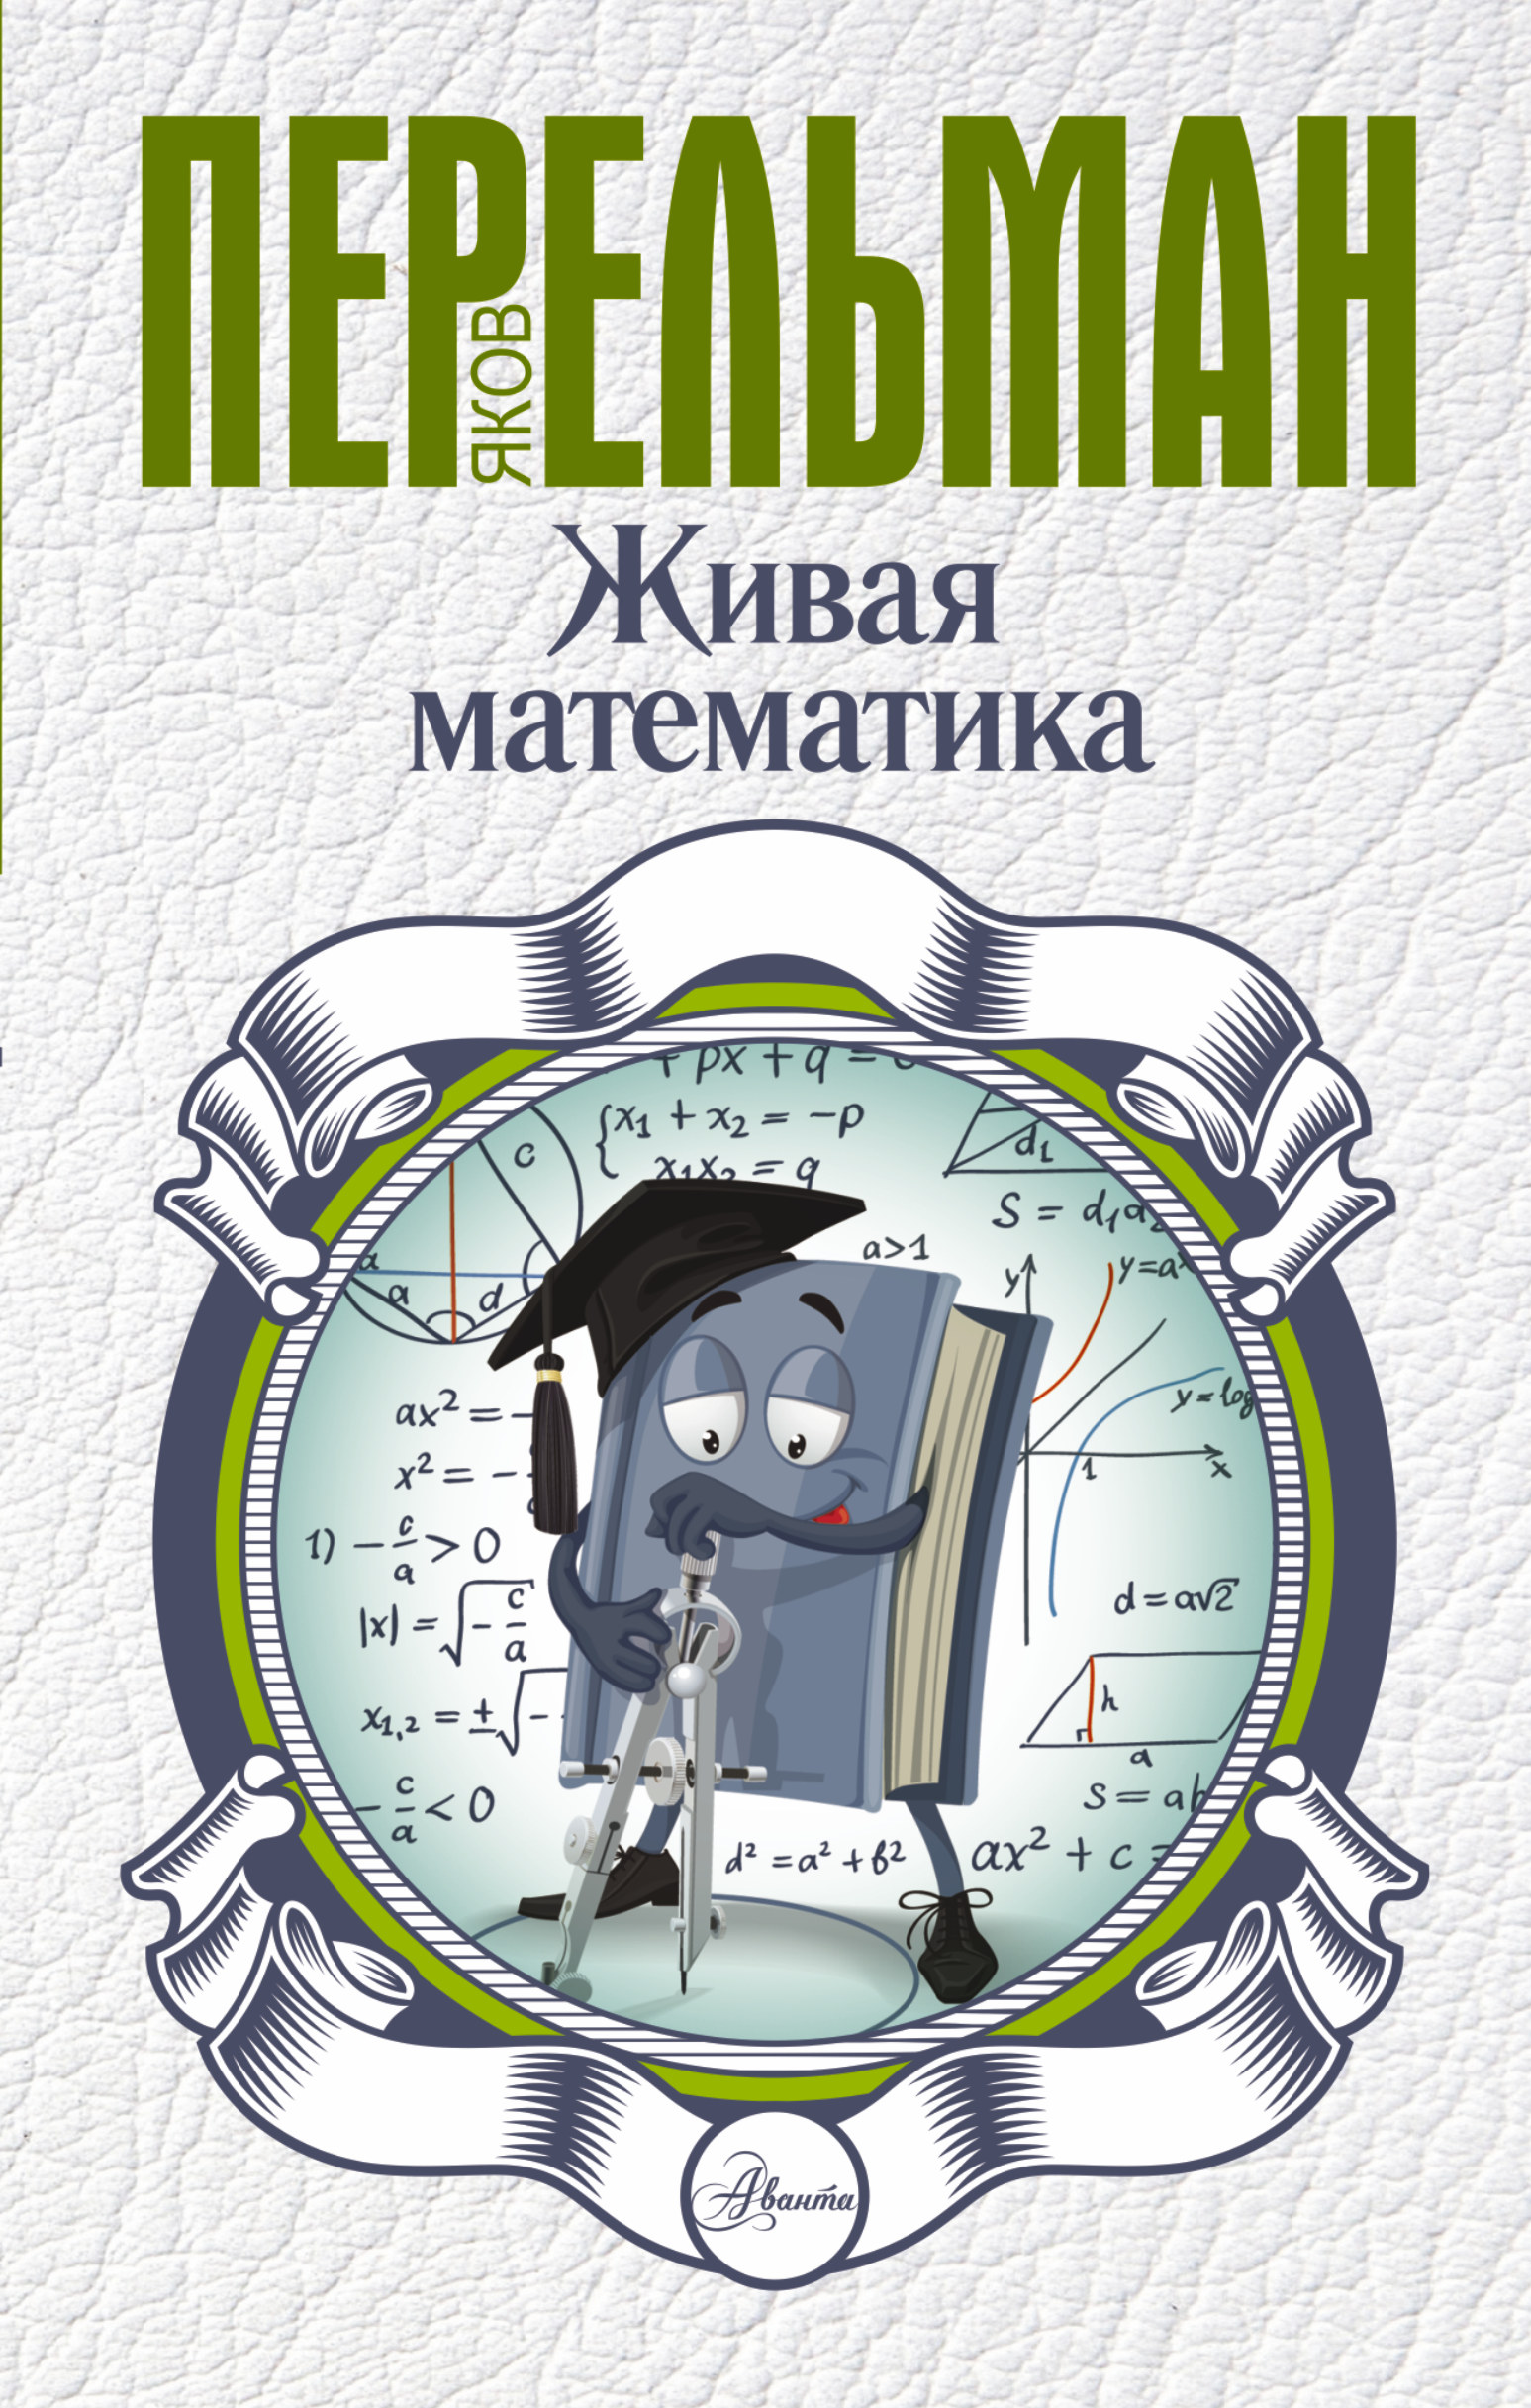 Живая математика ( Перельман Я.И.  )